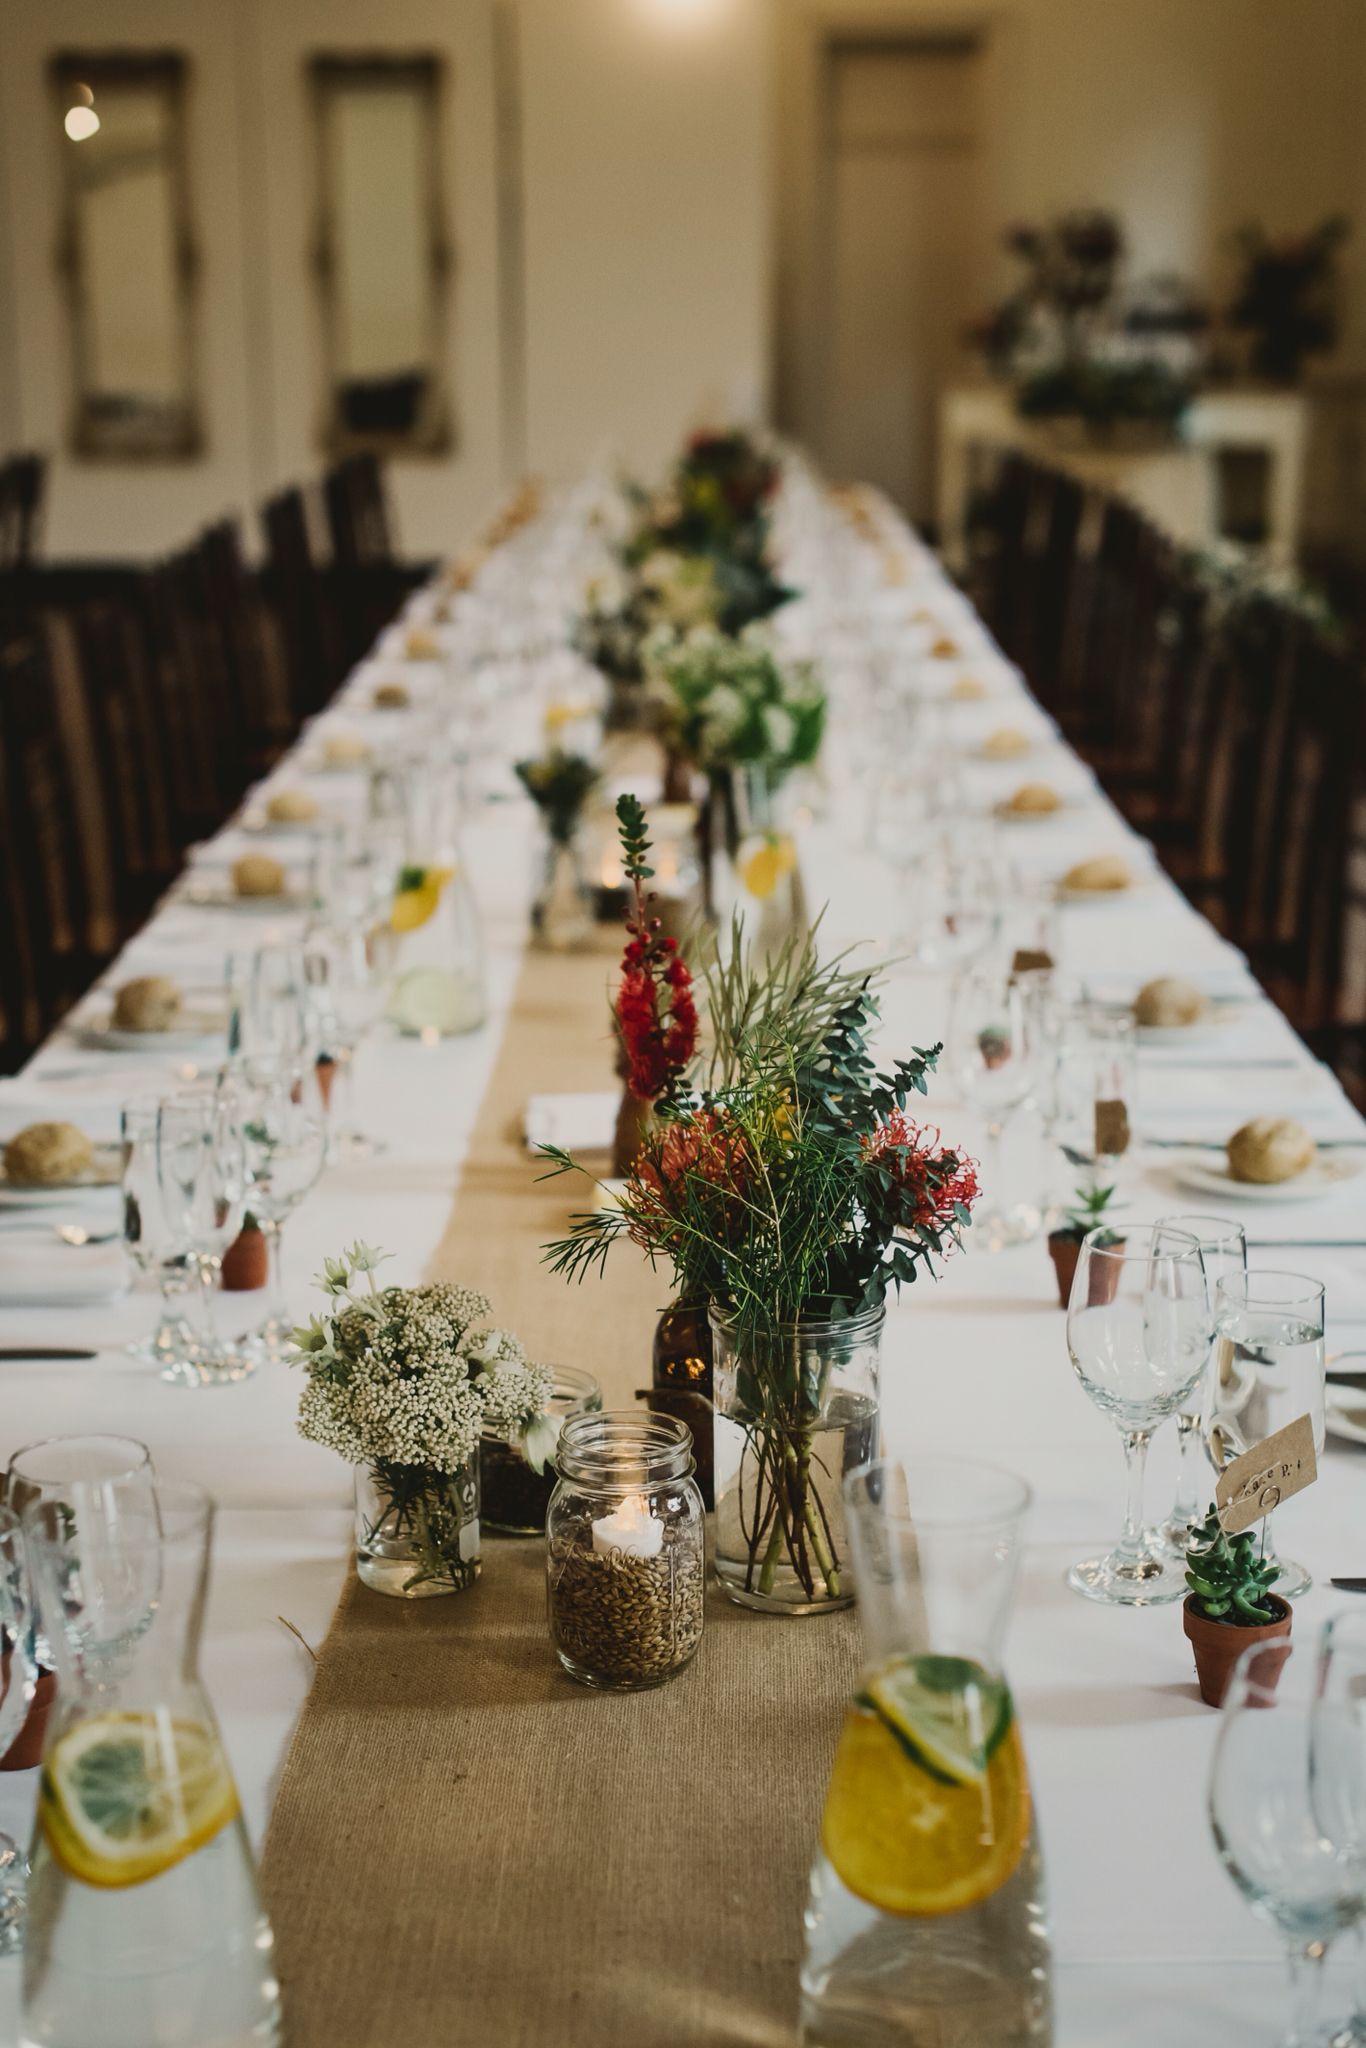 Reception Venue Long Tables Hessian Runners Australian Native Eucalyptus Malt Long Wedding Table Decorations Wedding Table Flowers Wedding Table Settings